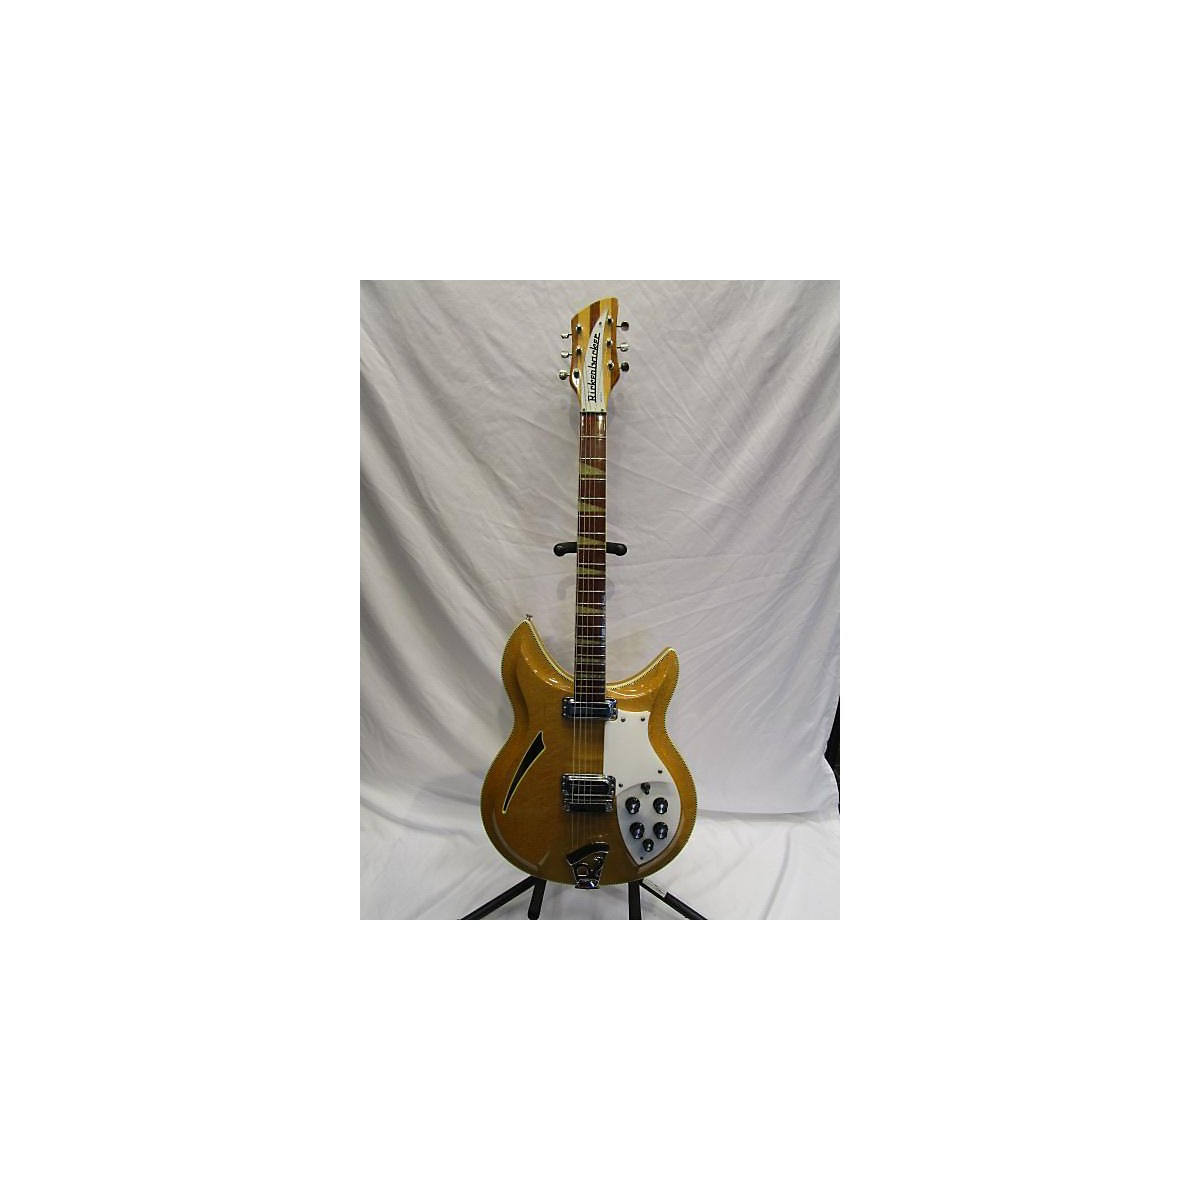 Rickenbacker 381V69 Hollow Body Electric Guitar